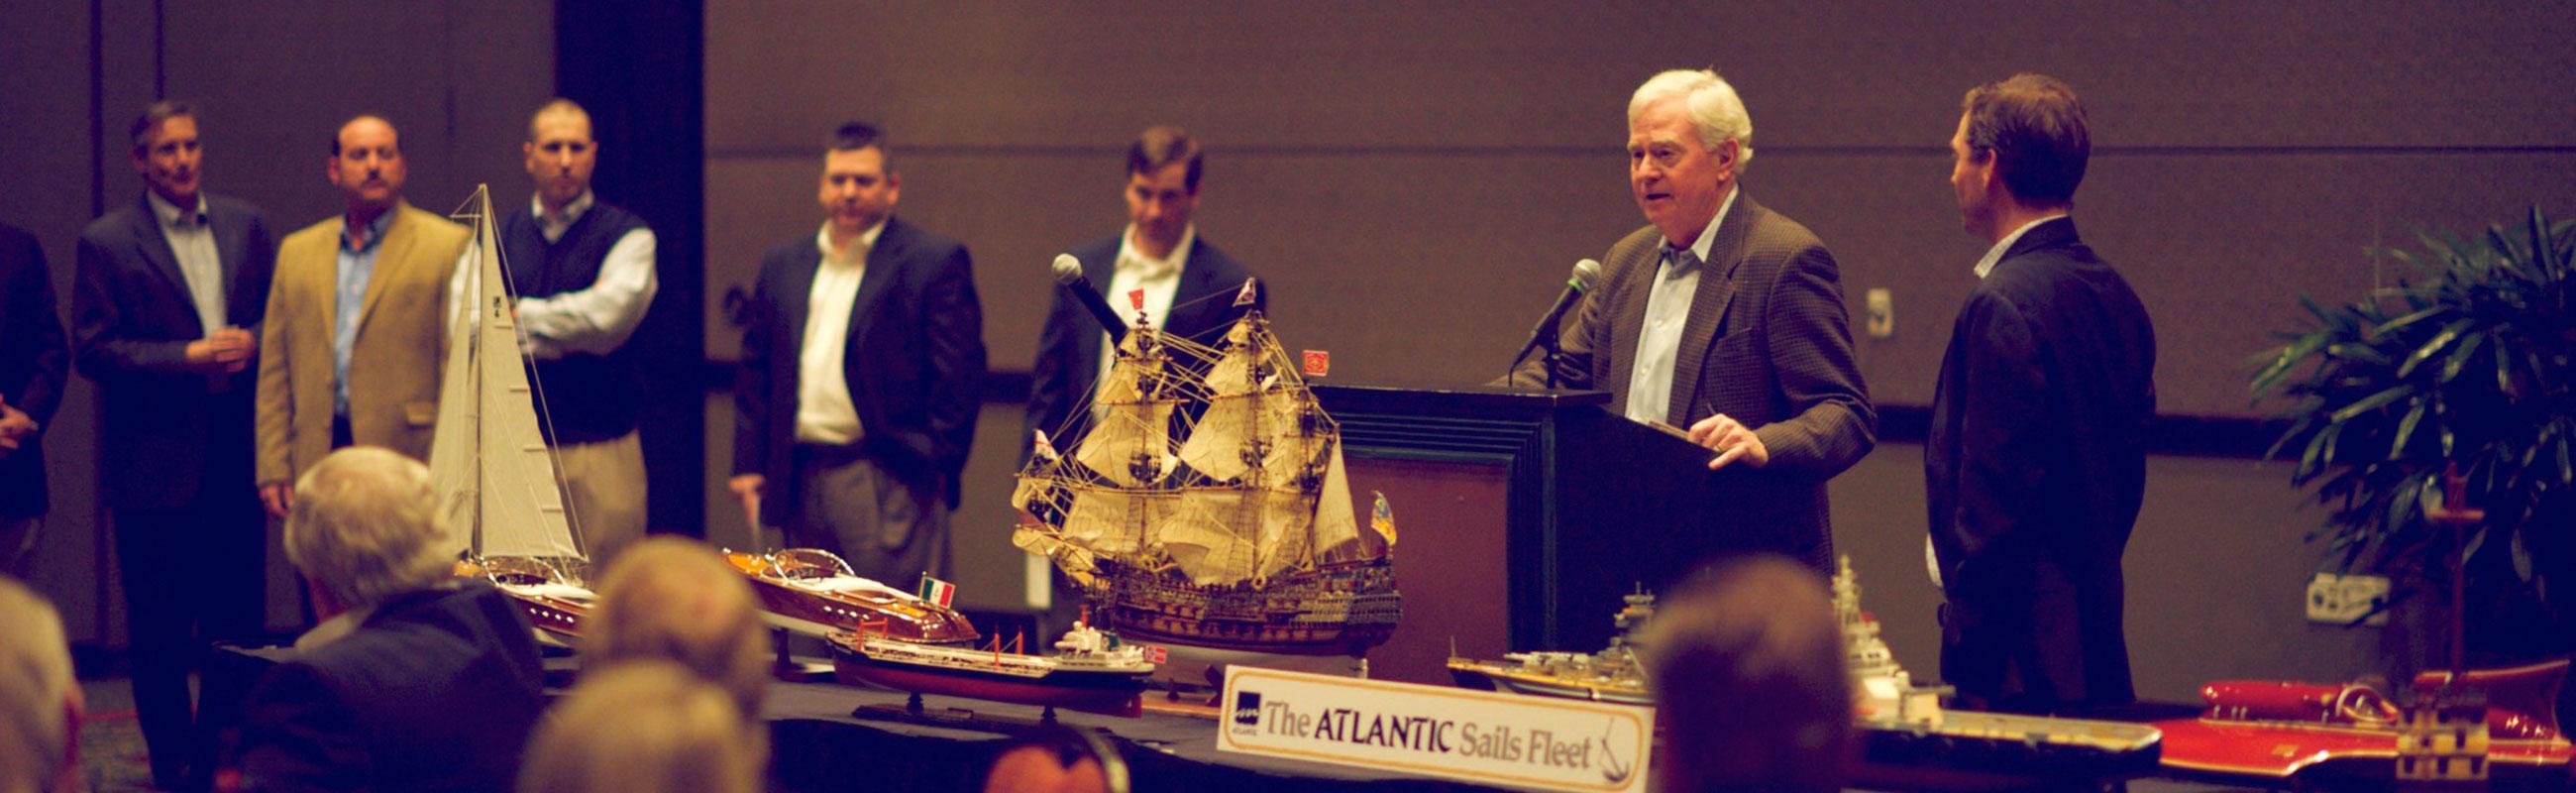 Atlantic sails fleet 2014 sales meeting